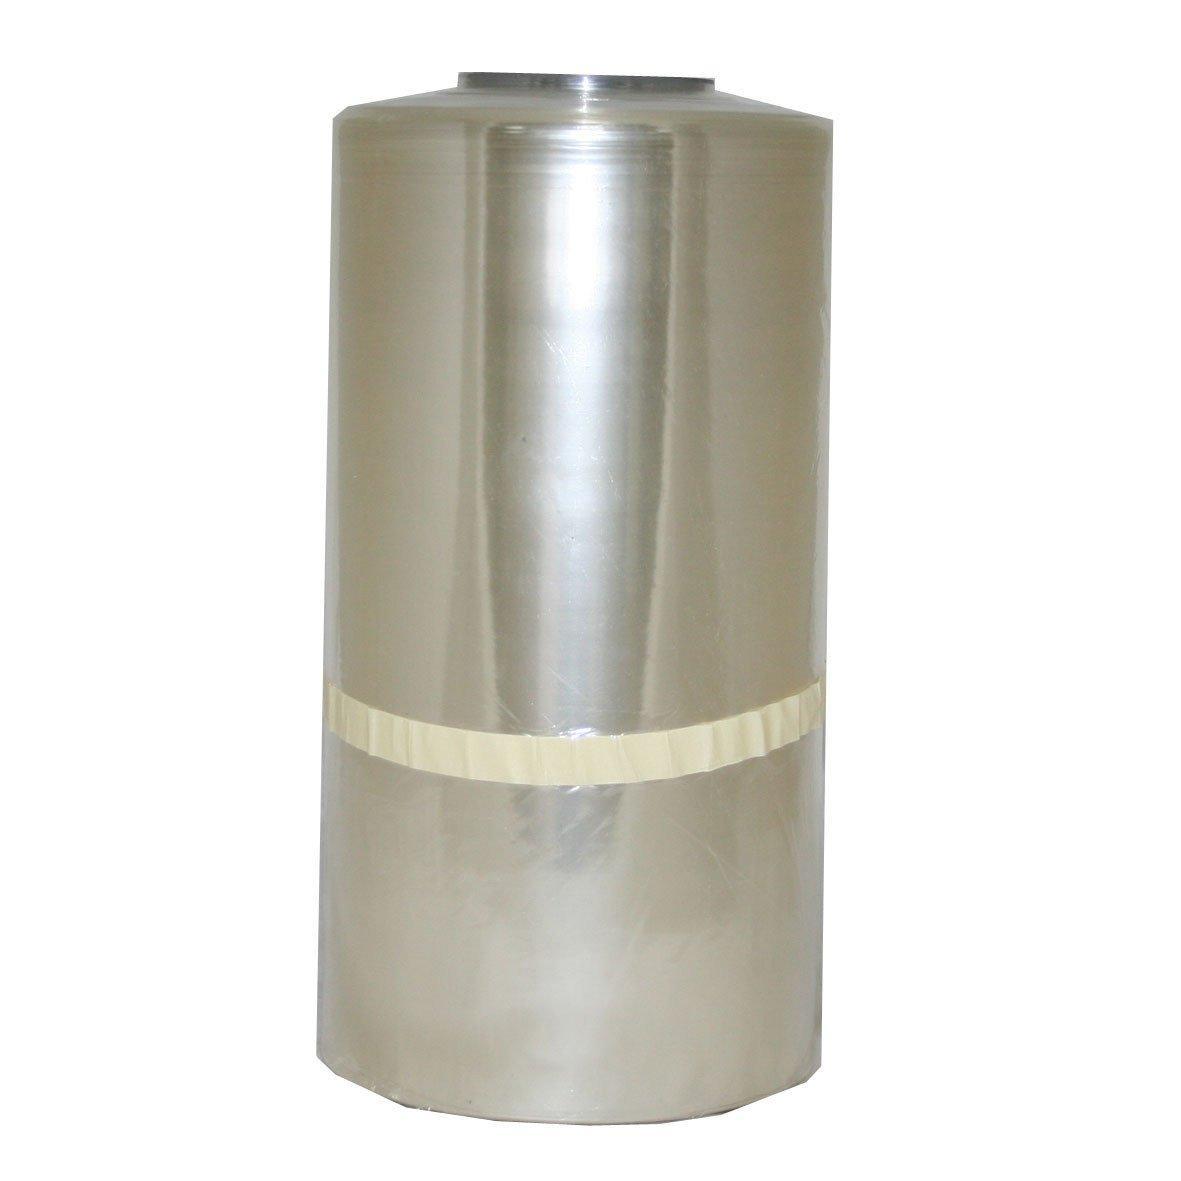 Плёнка термоусадочная полурукав ПВХ 350/700мм х 650м 15мкм, RANPAC